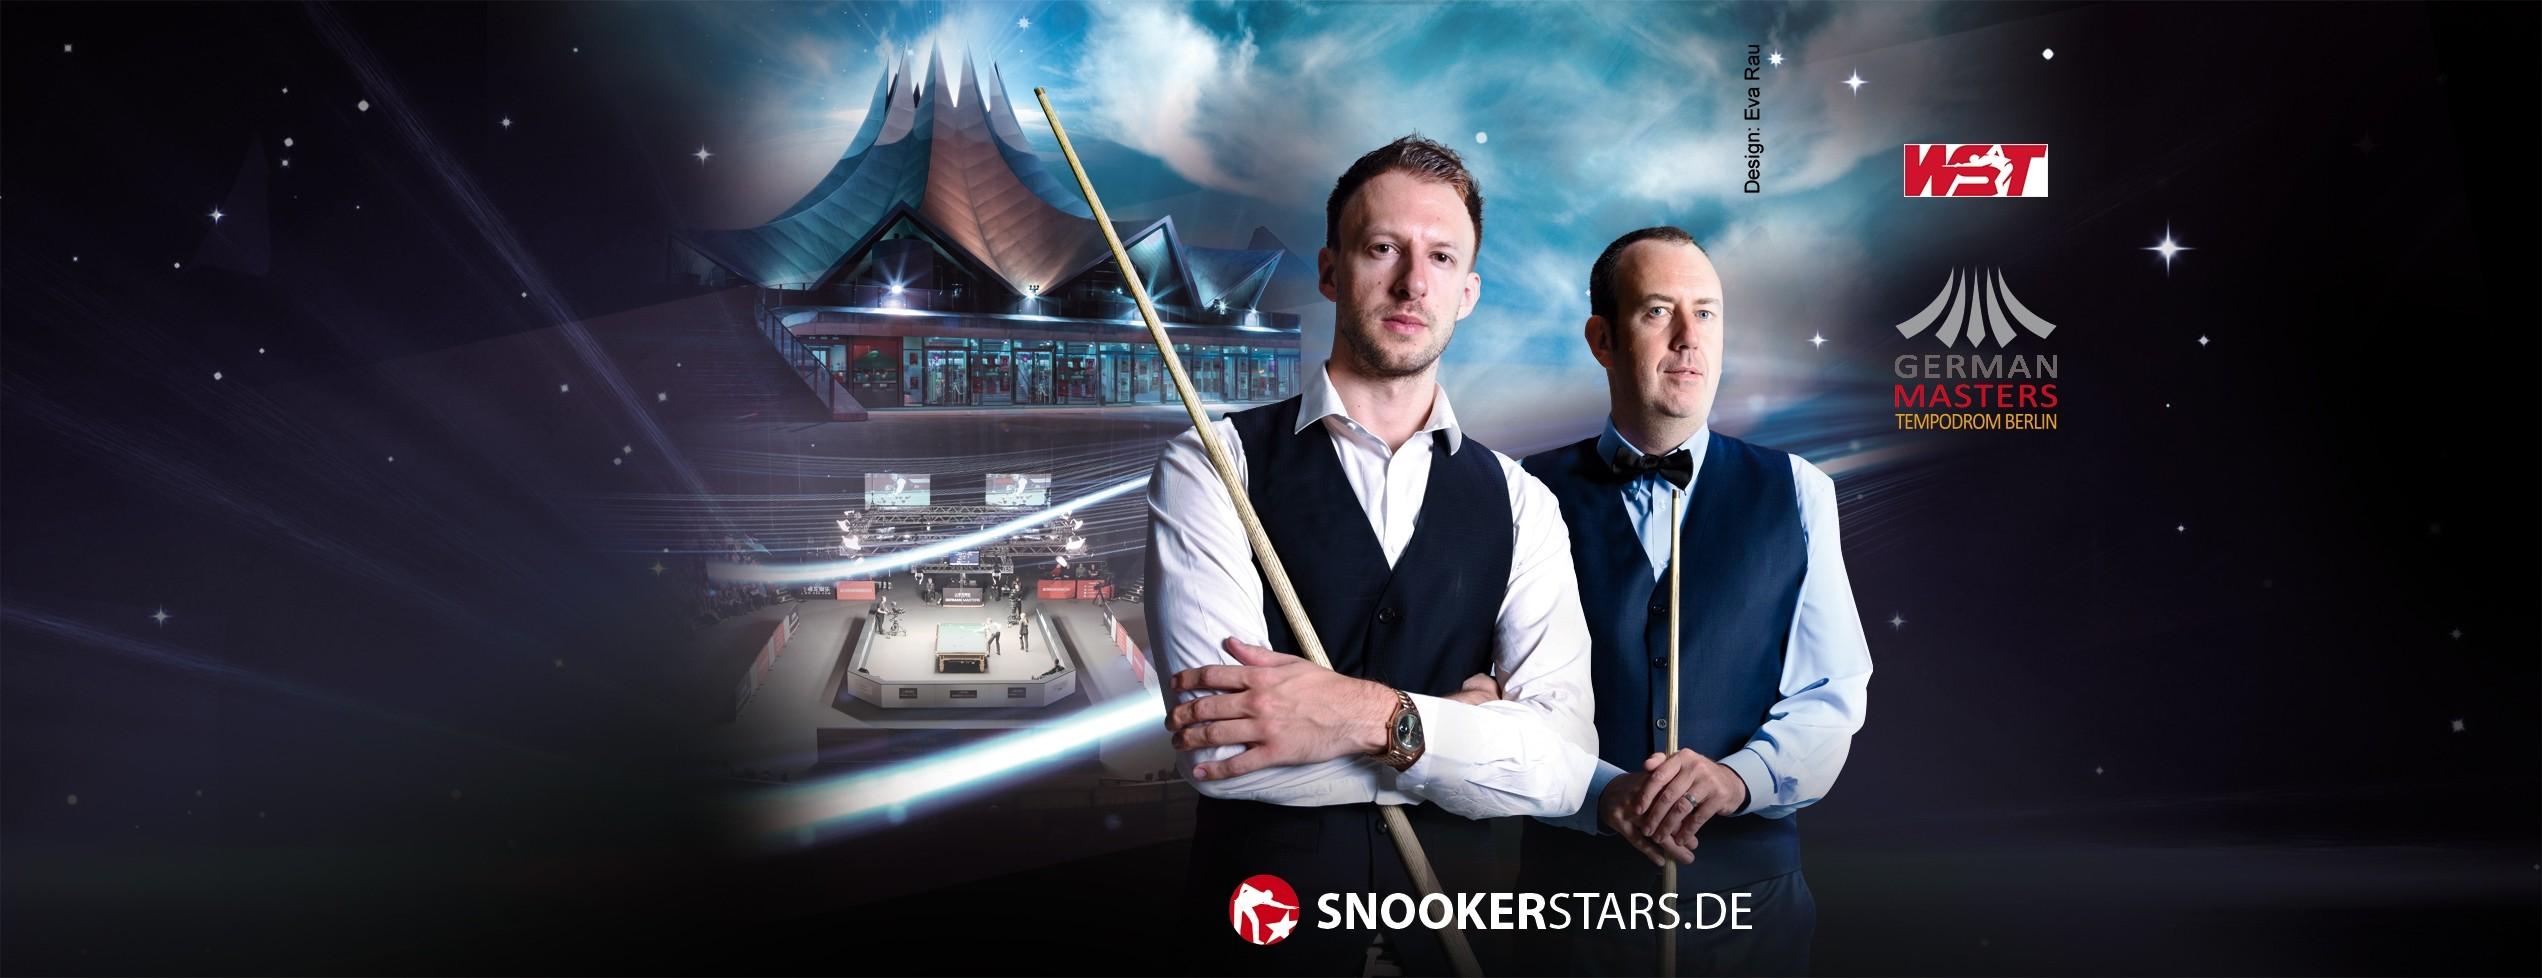 German Masters 30.01.2021 KAT 2 Abend-Session